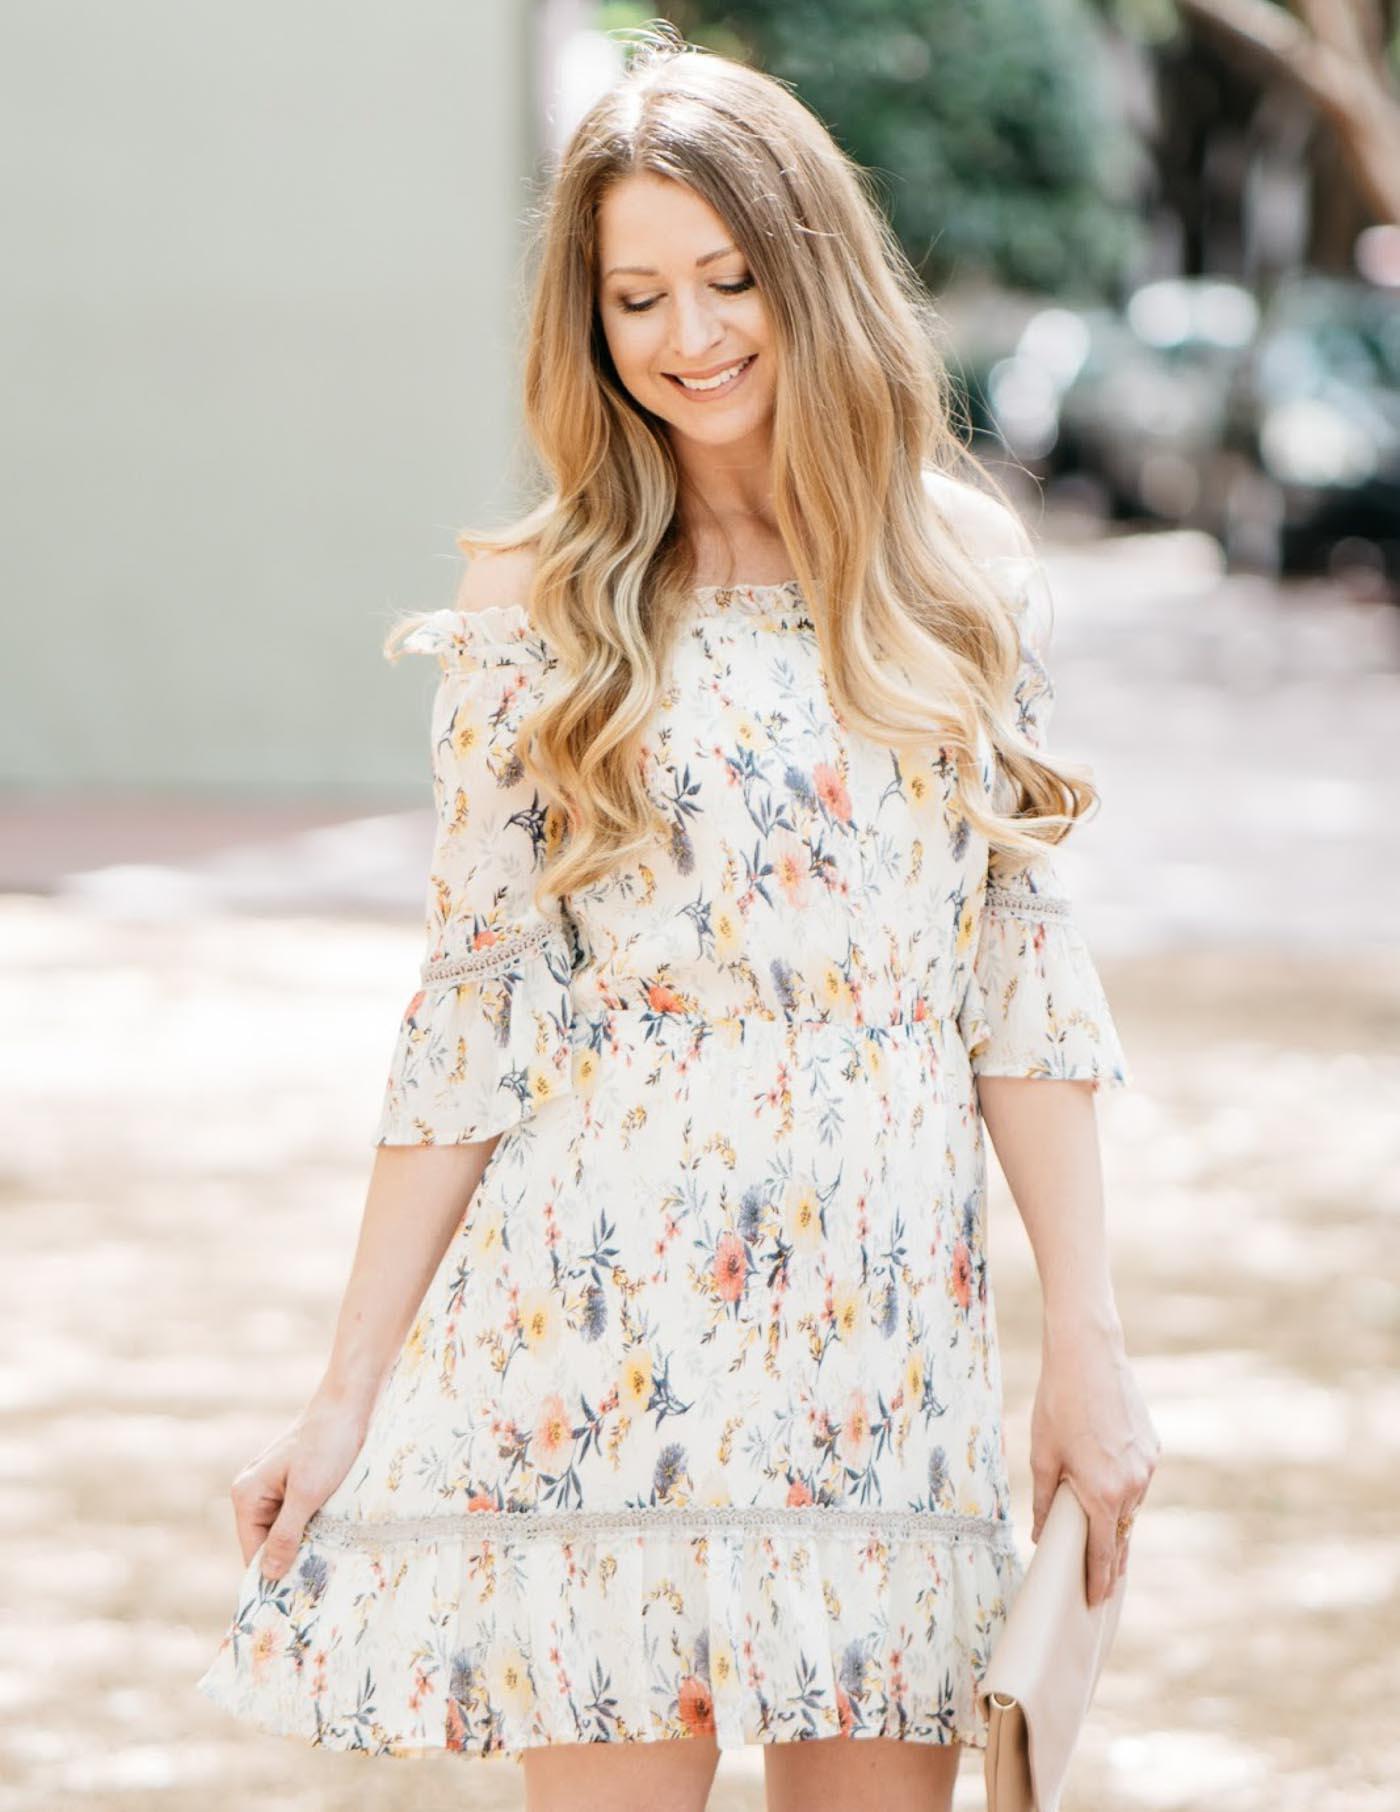 best floral dress for summer - The Blog Societies